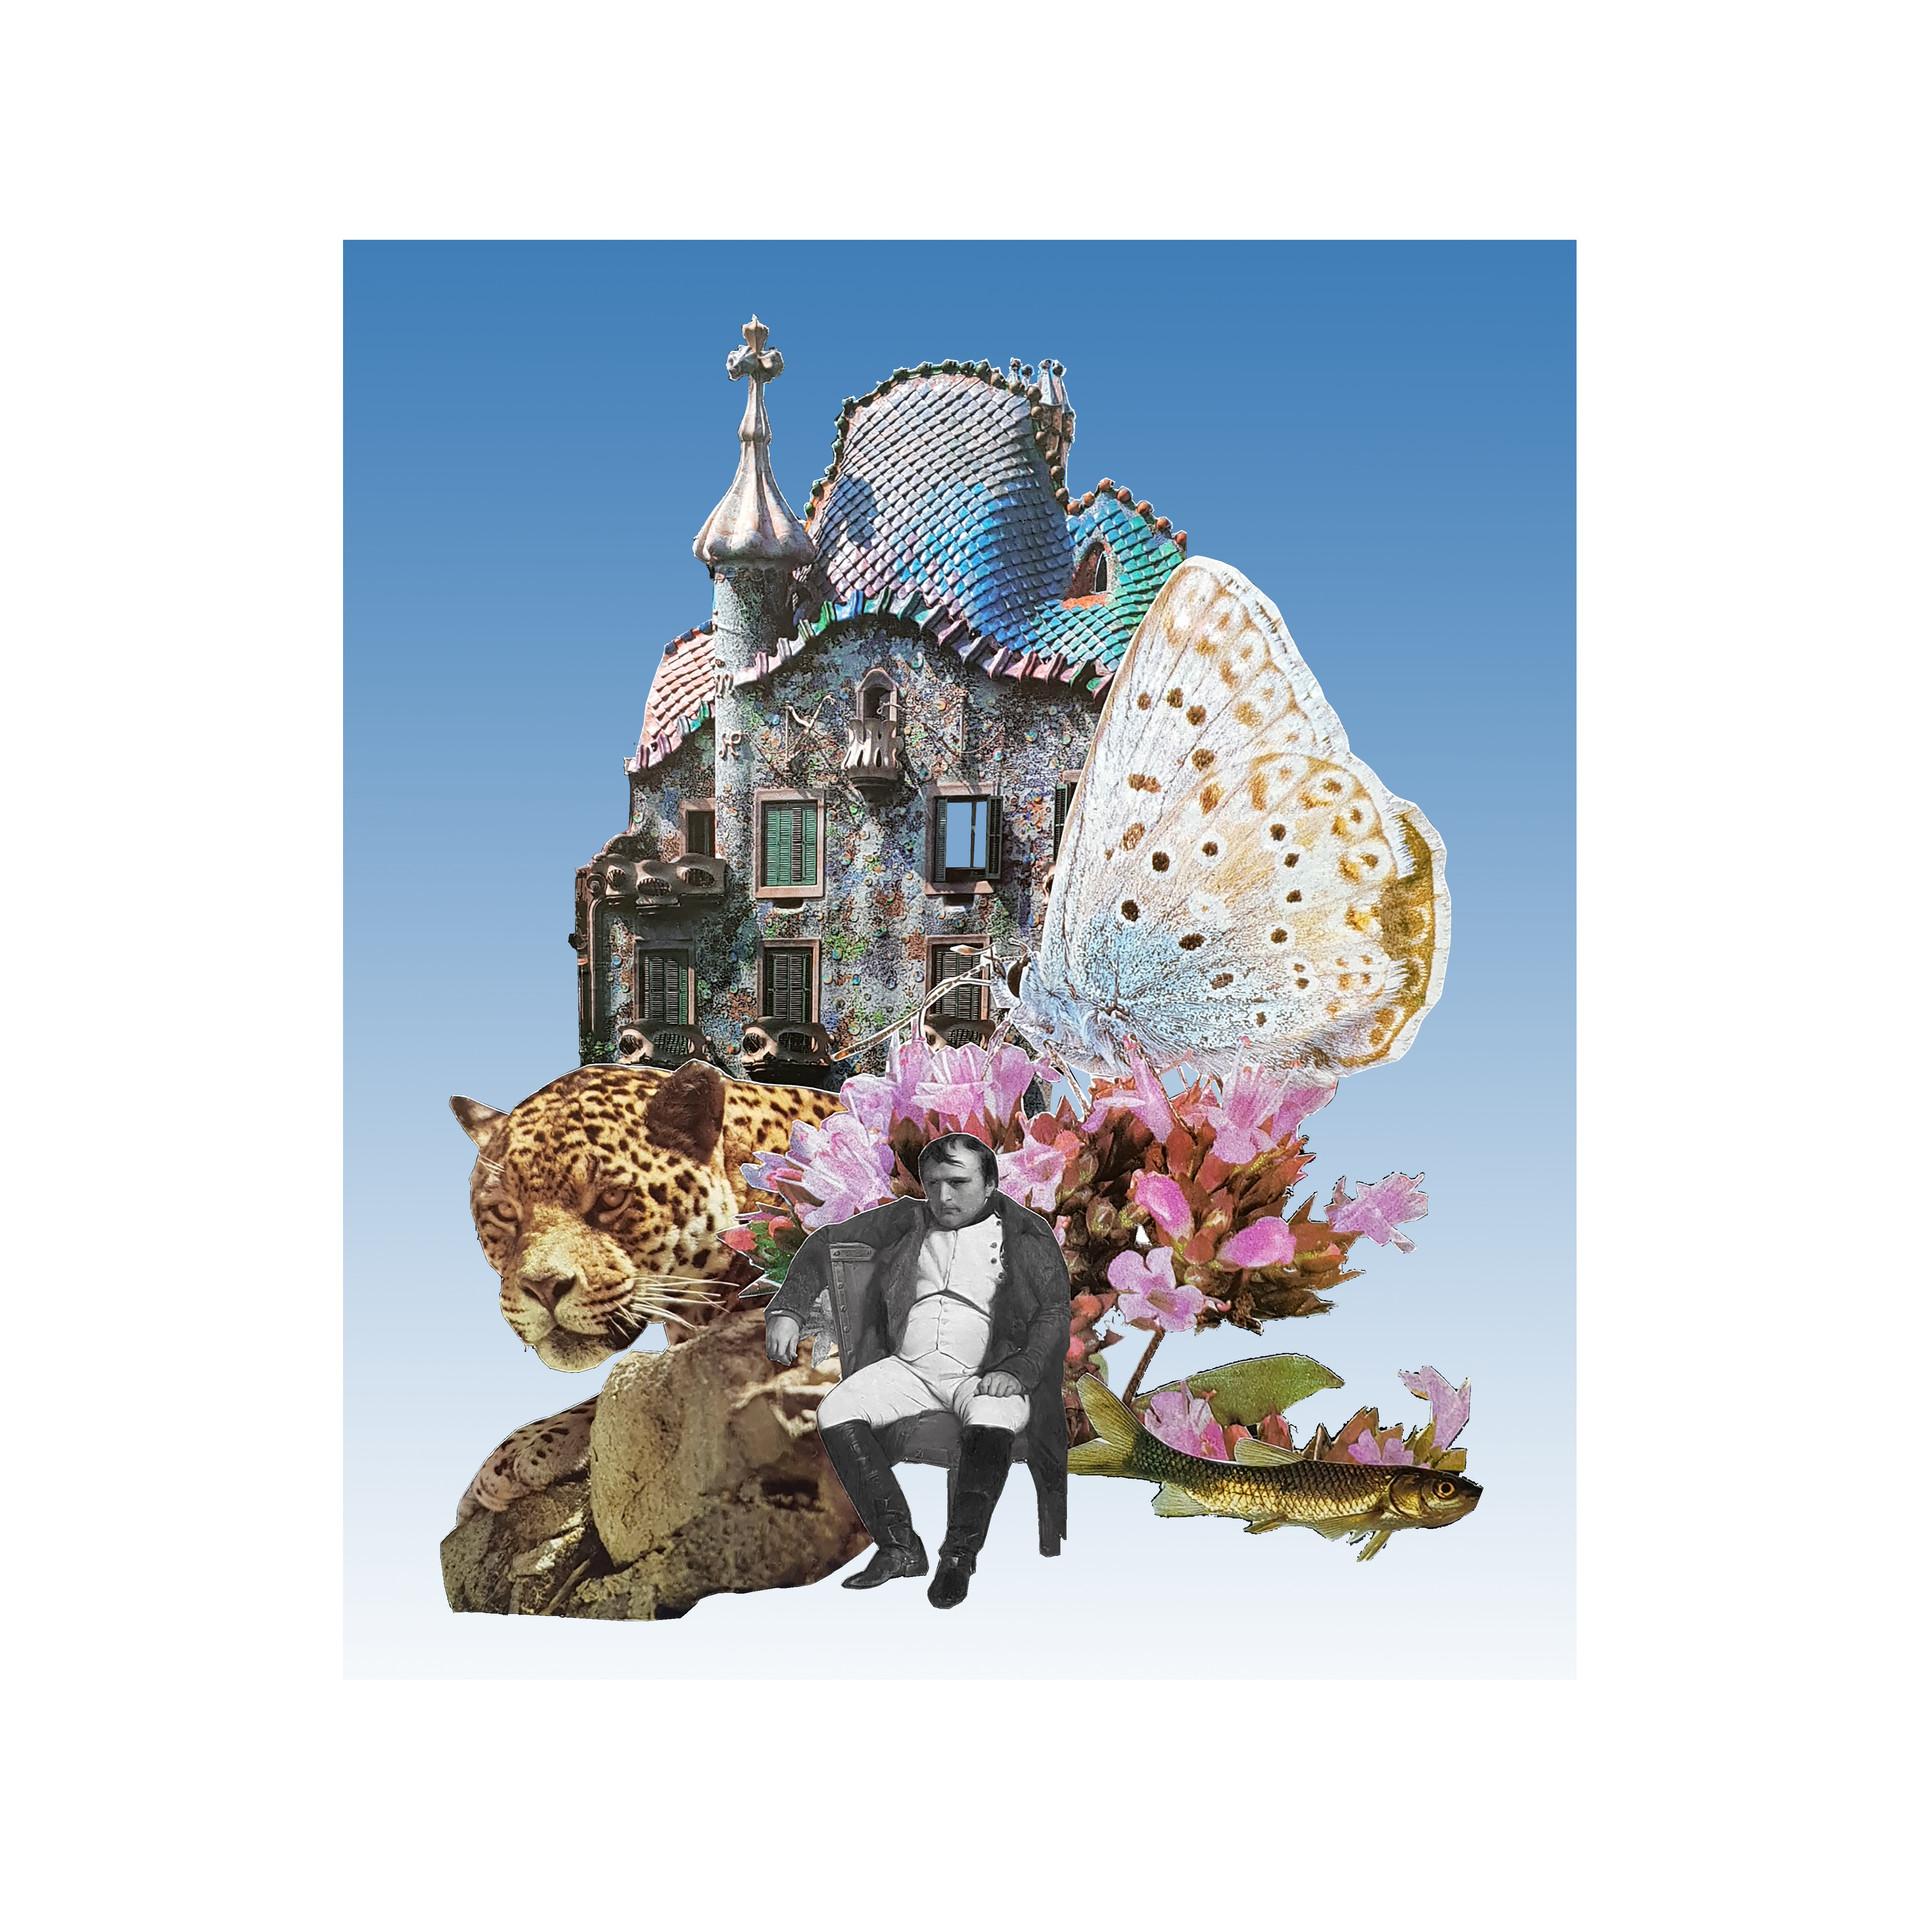 Napoleonceleste - El Recreo Collage